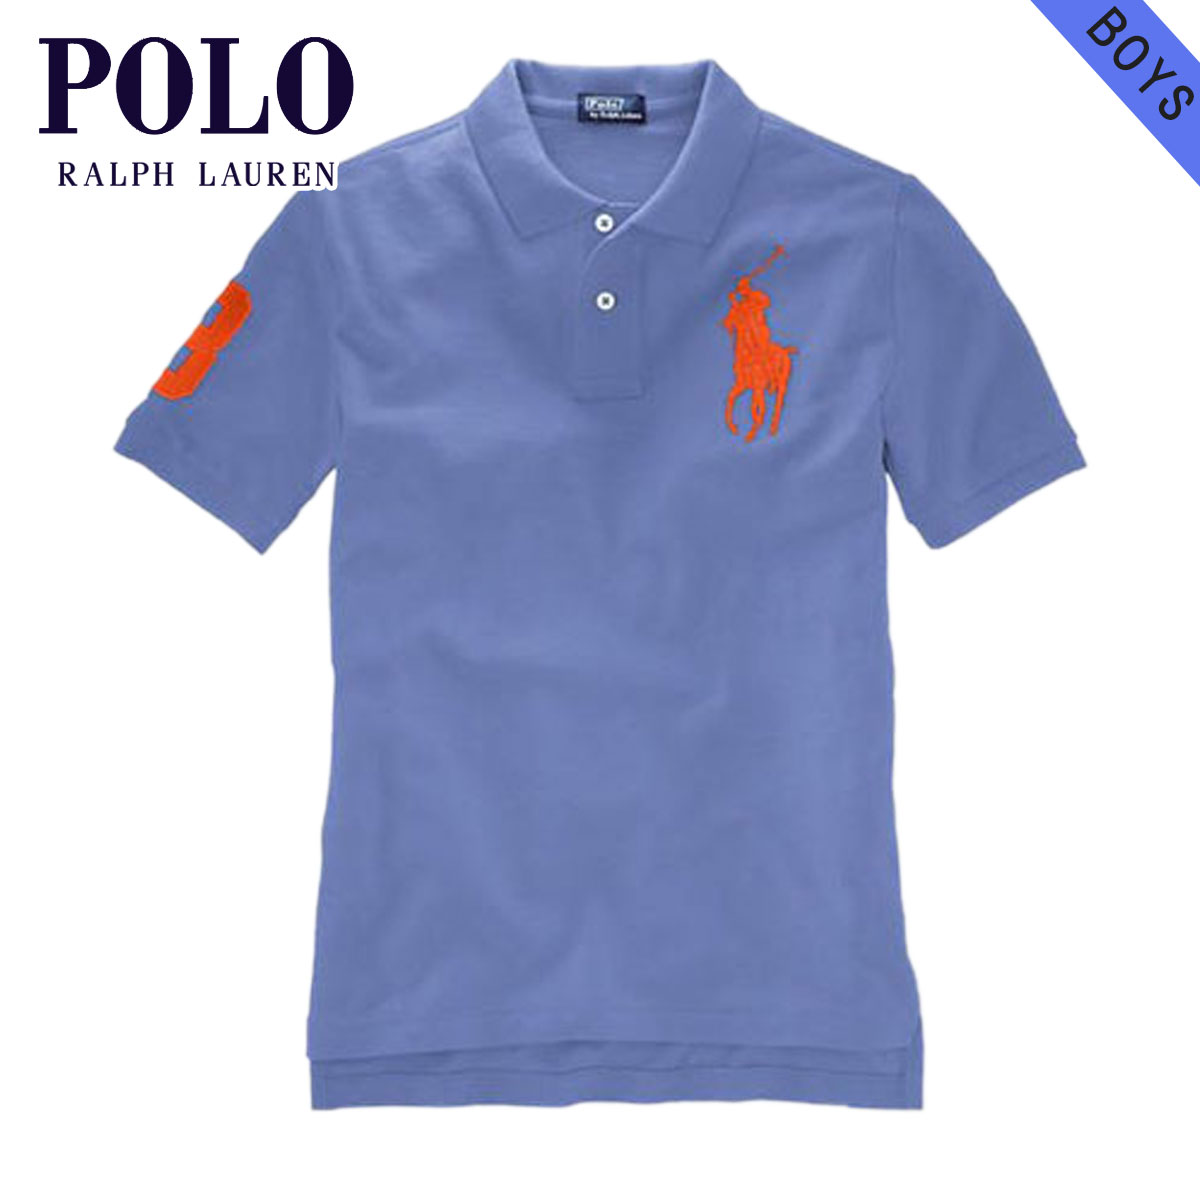 aec38c876855 Poloralflorenkids POLO RALPH LAUREN CHILDREN genuine kids clothing boys Polo  Shirt Big Pony Polo Shirt  15673586 BLUE 10P22Jul14